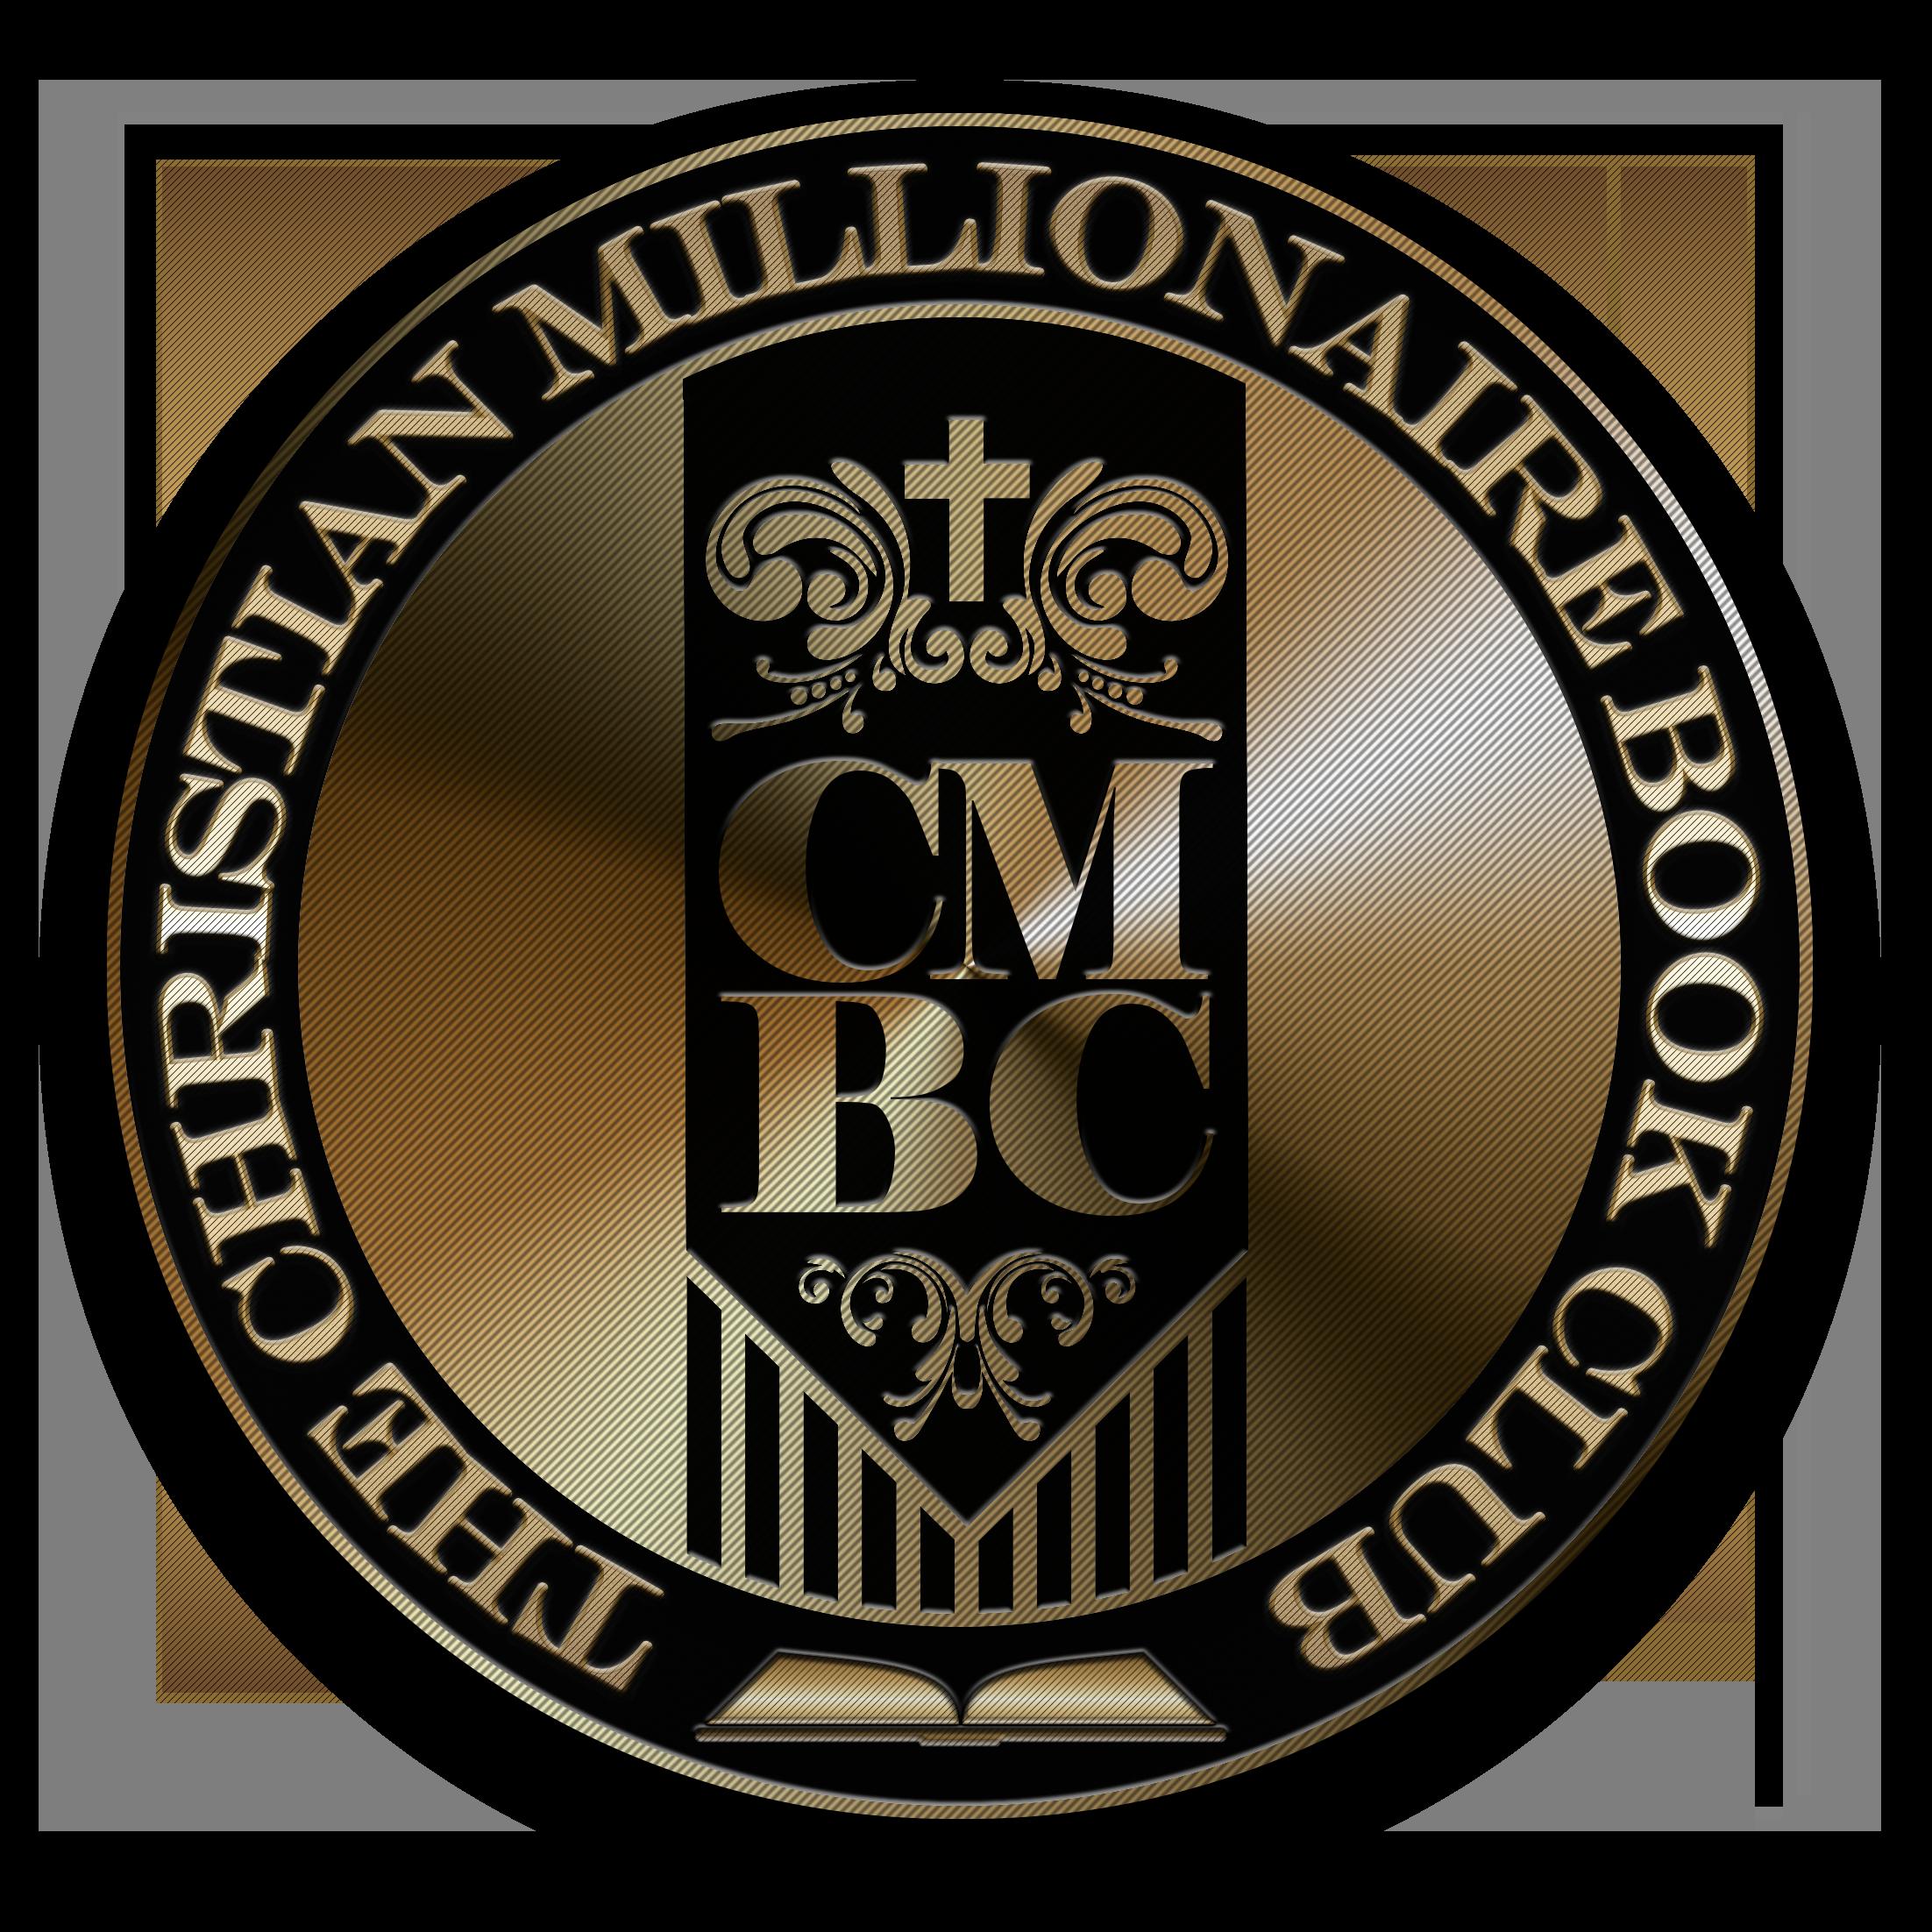 The Christian Millionaire Bookclub